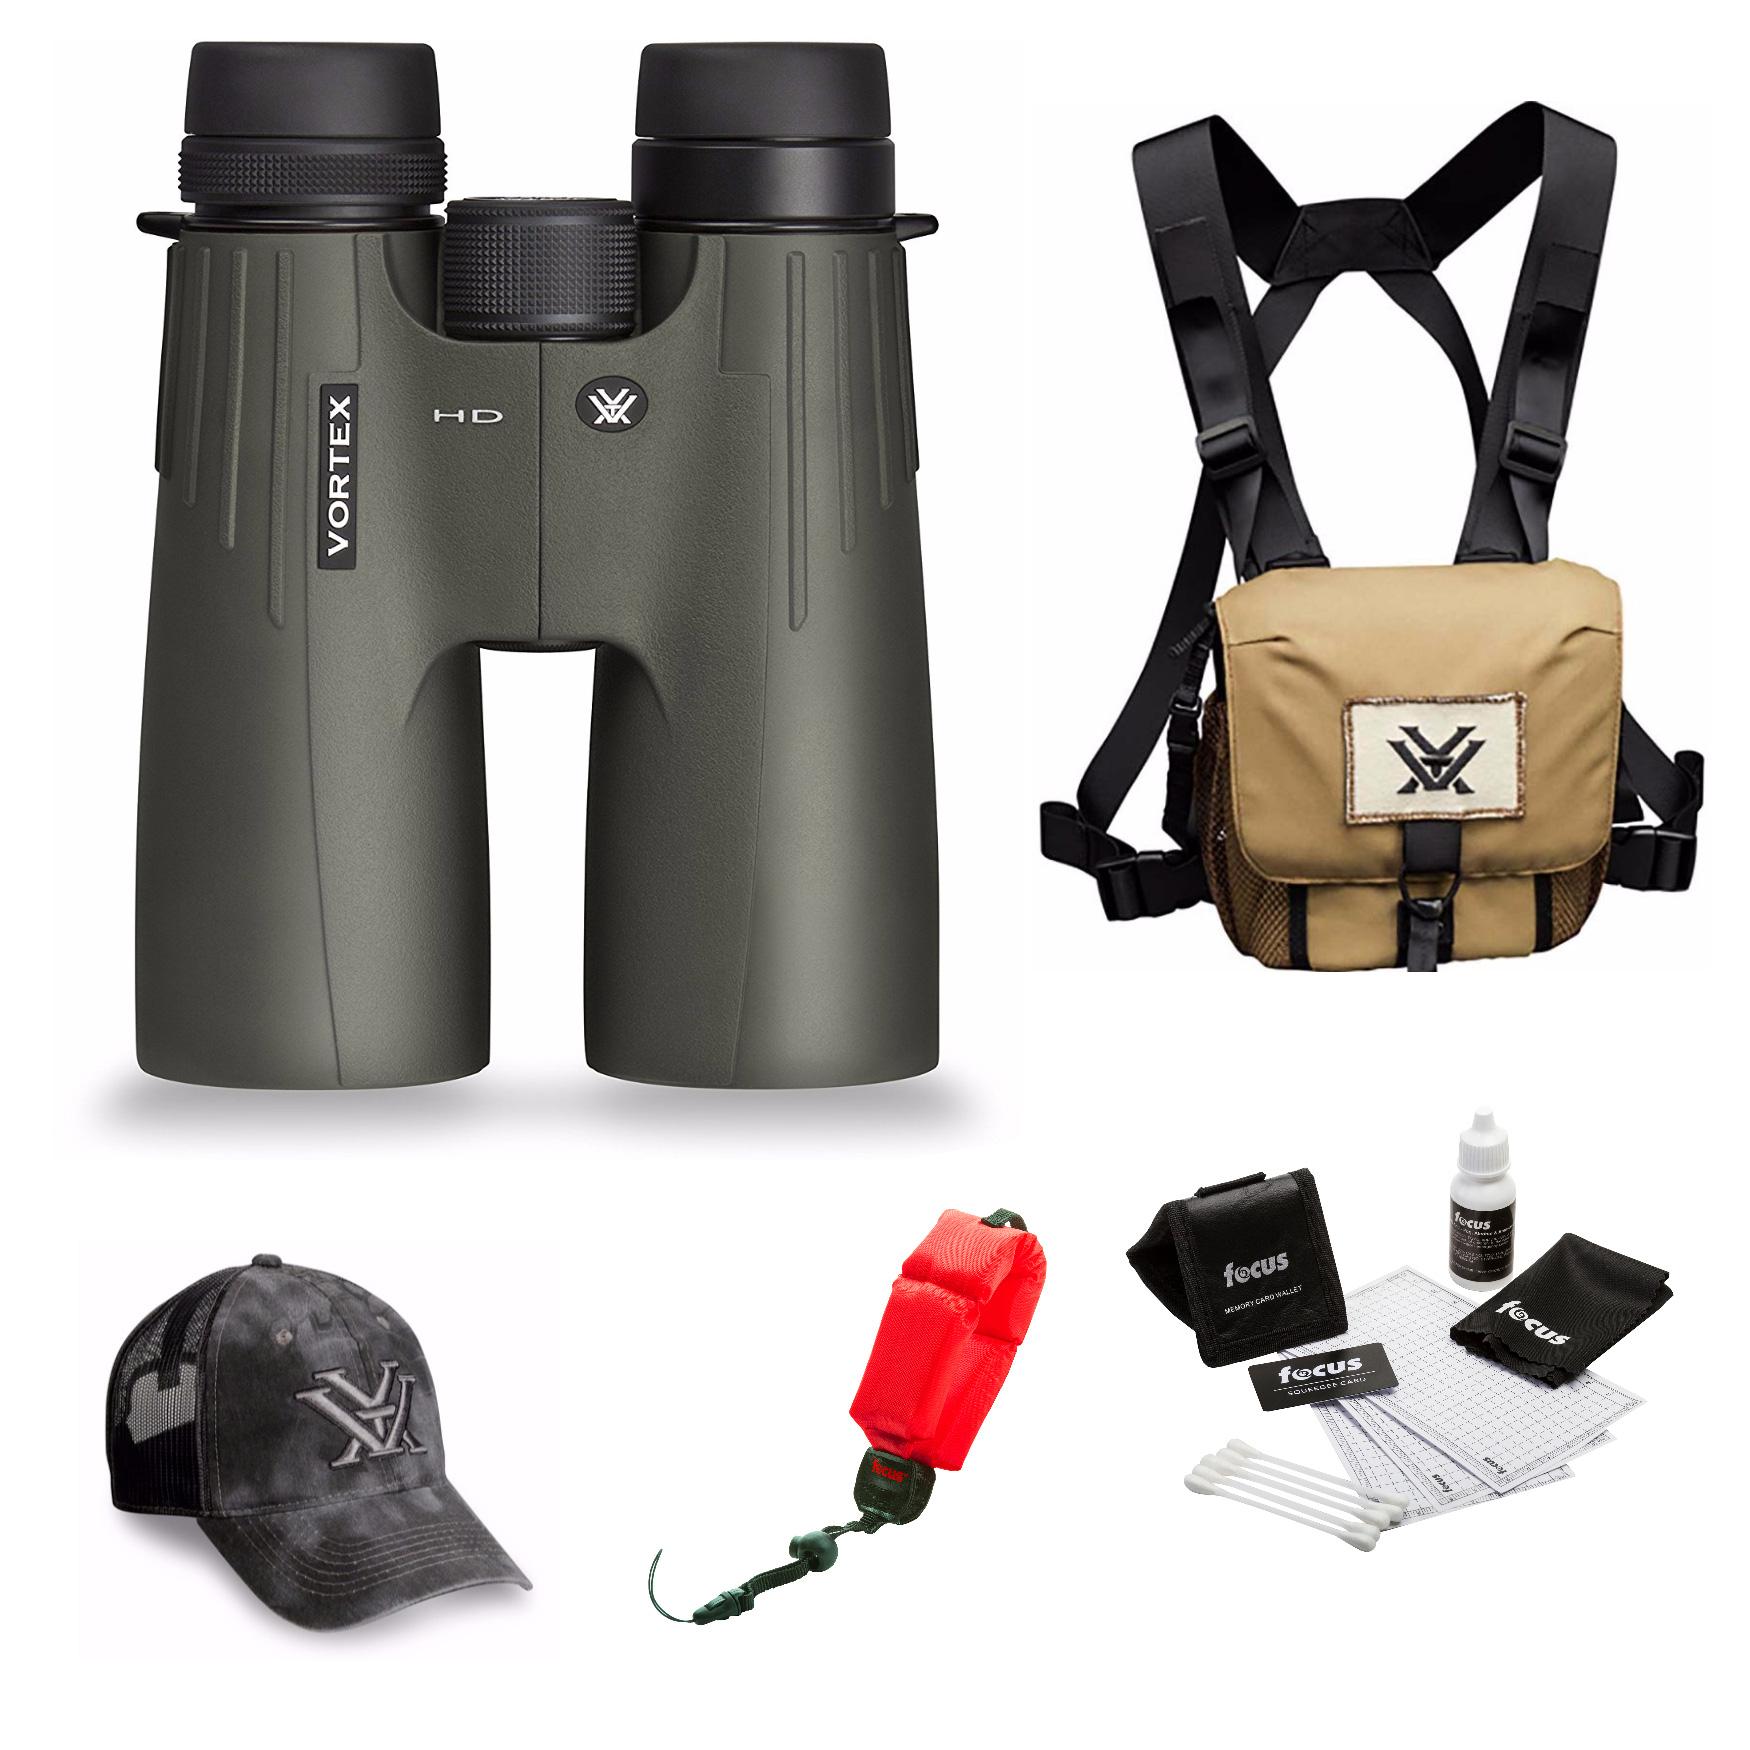 Vortex Optics Viper HD 10x50 Roof Prism Binocular  + Glasspak Harness Bundle